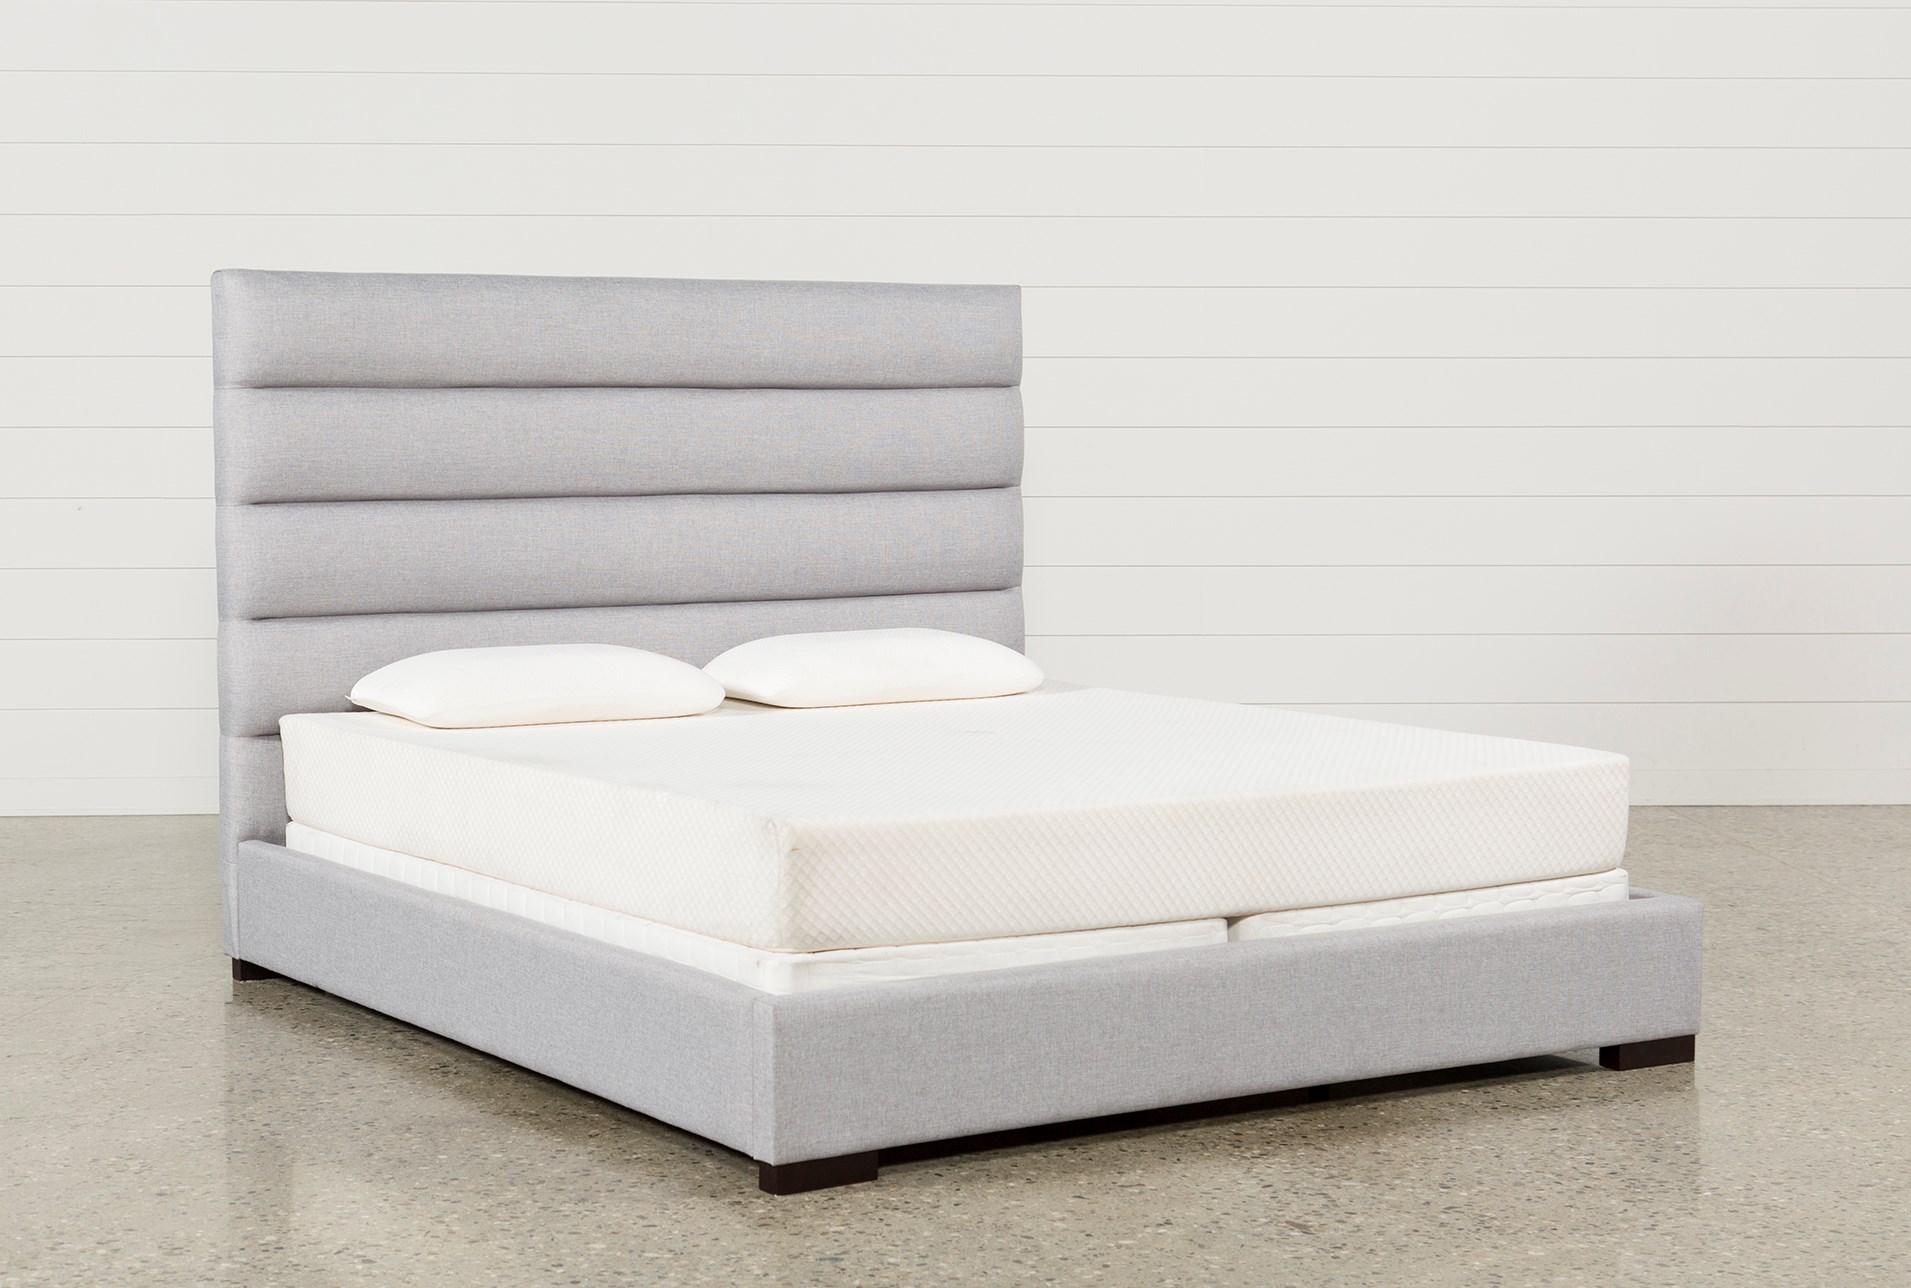 california king bed frame. Display Product Reviews For KIT-HUDSON CALIFORNIA KING UPHOLSTERED PLATFORM BED California King Bed Frame